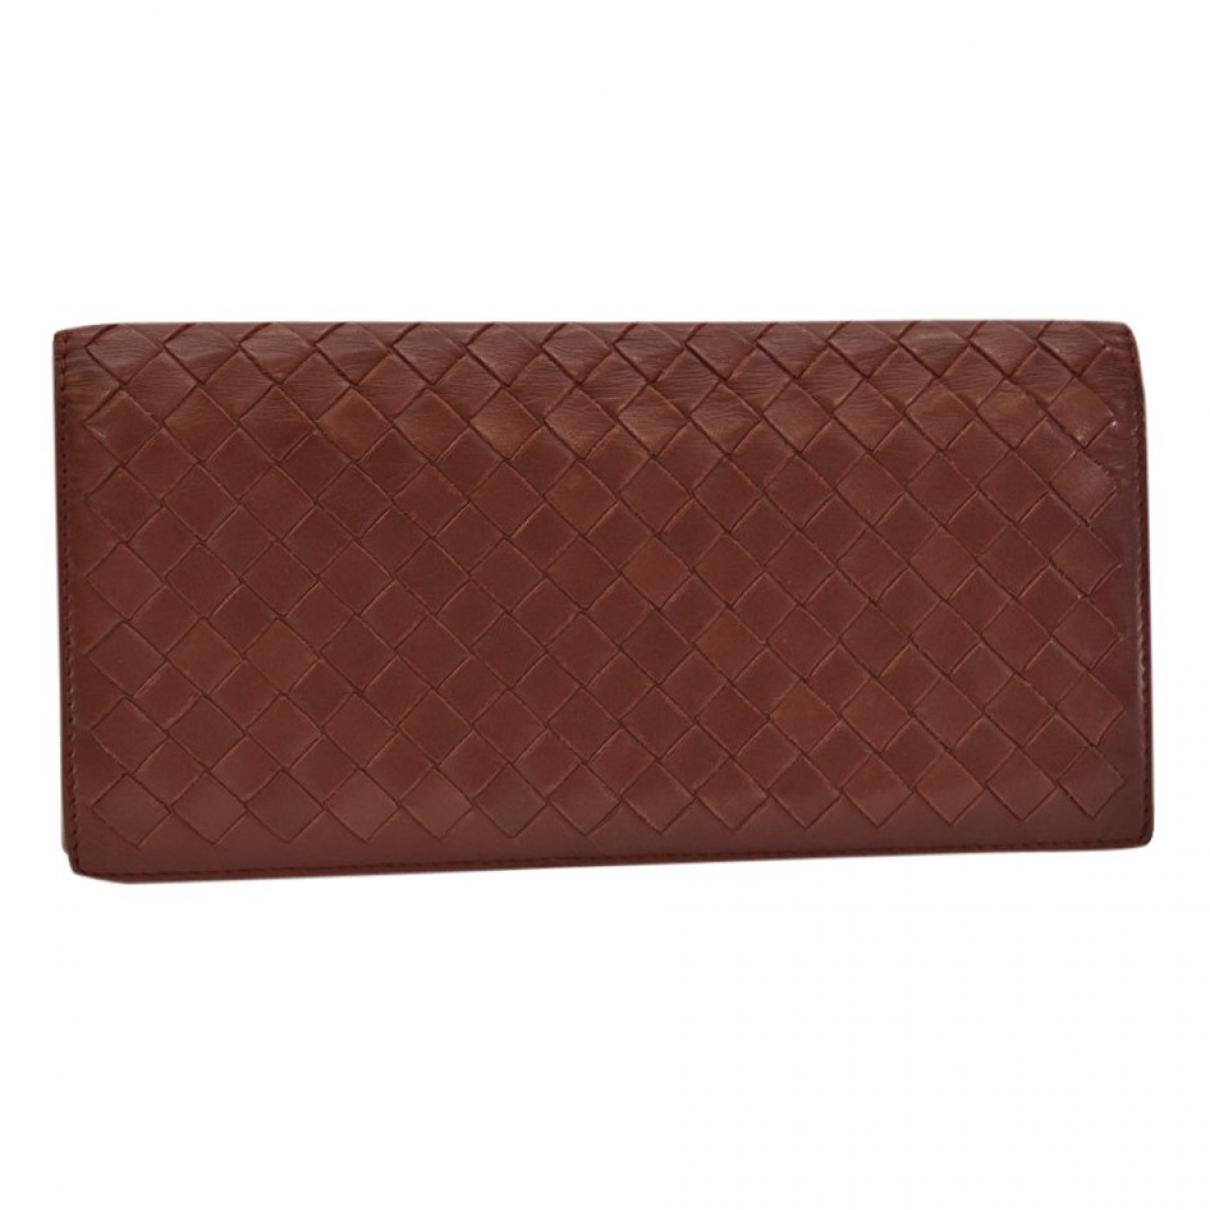 Bottega Veneta Intrecciato Red Leather wallet for Women N